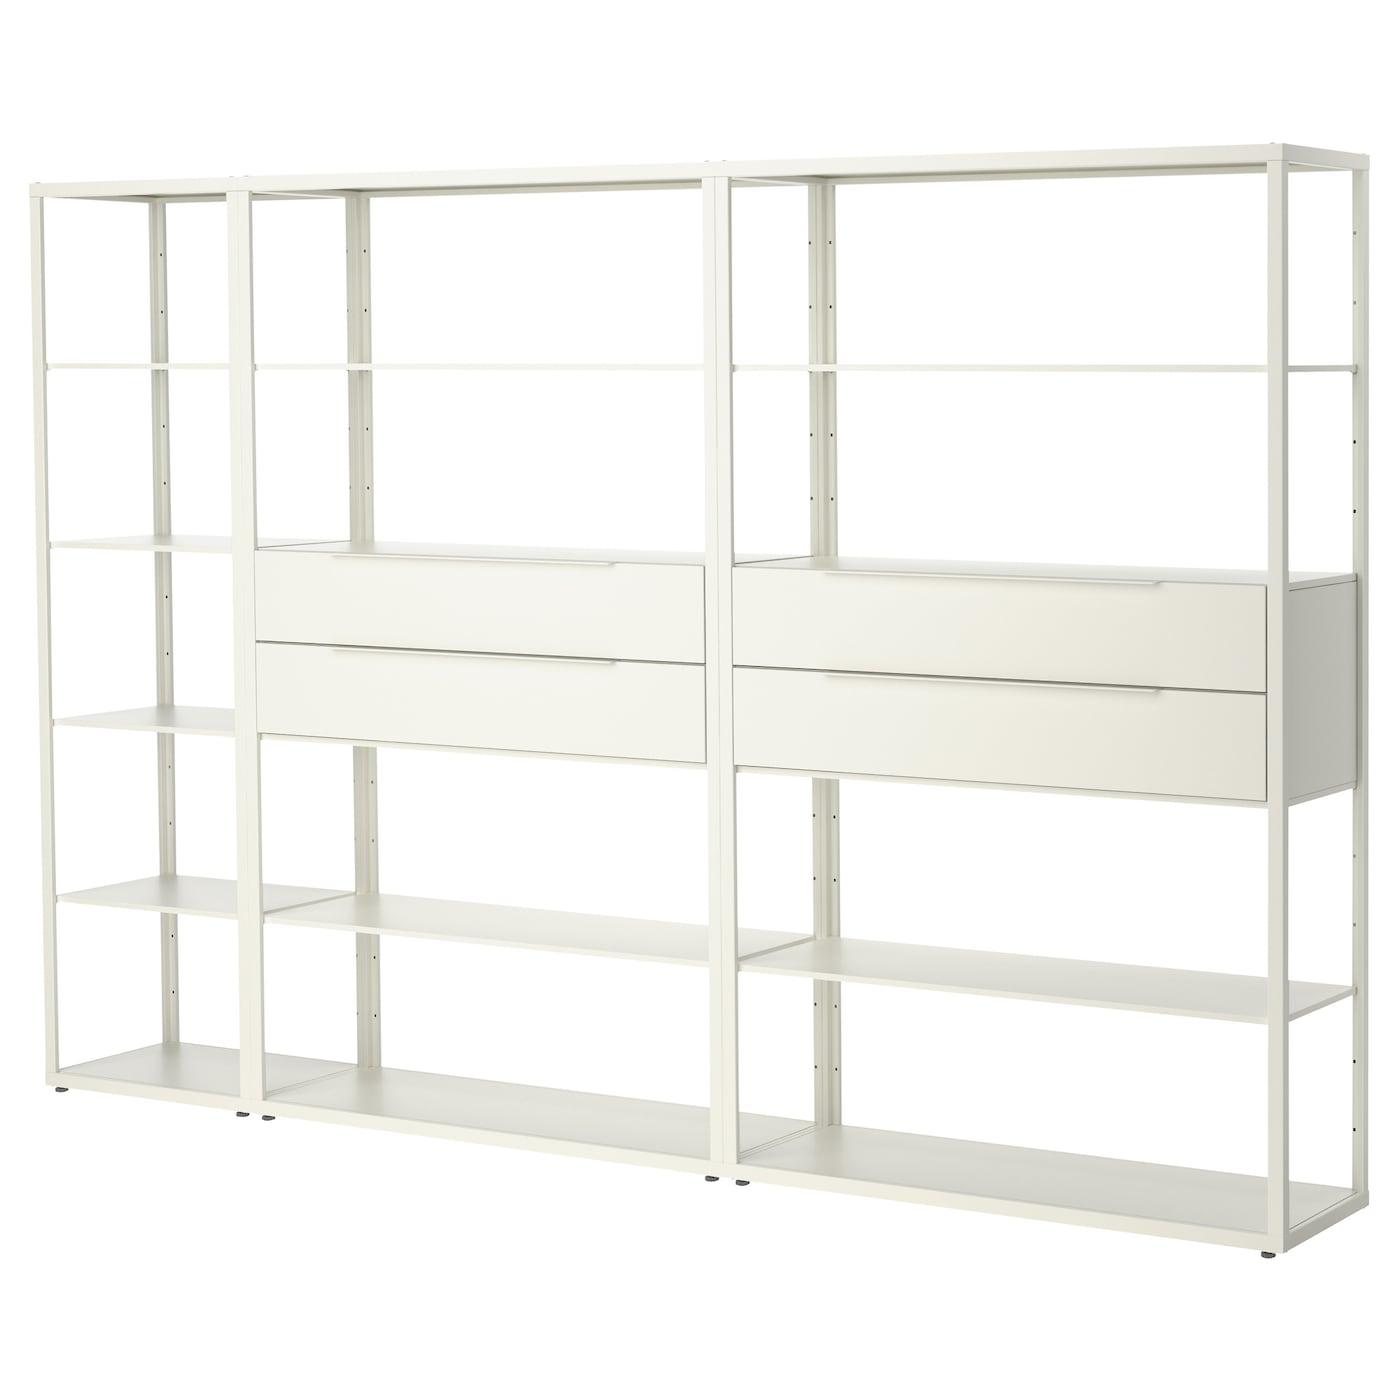 fj lkinge shelving unit with drawers white 294x193 cm ikea. Black Bedroom Furniture Sets. Home Design Ideas